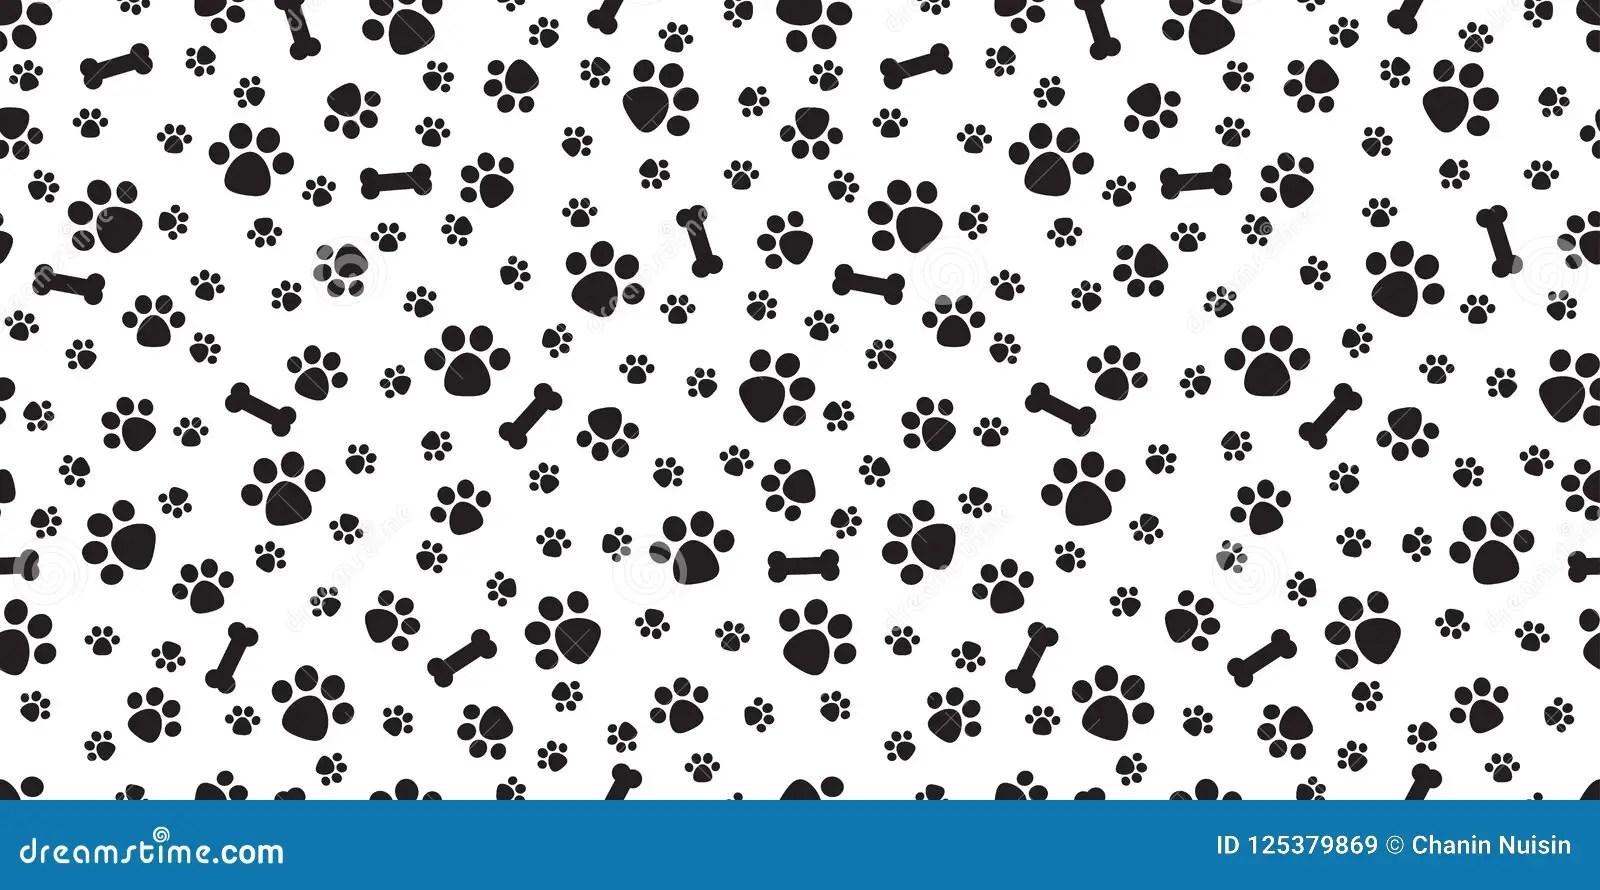 Dog Paw Seamless Pattern Vector Dog Bone Isolated Puppy Cat Wallpaper Background White Stock Illustration Illustration Of Seamless Cartoon 125379869